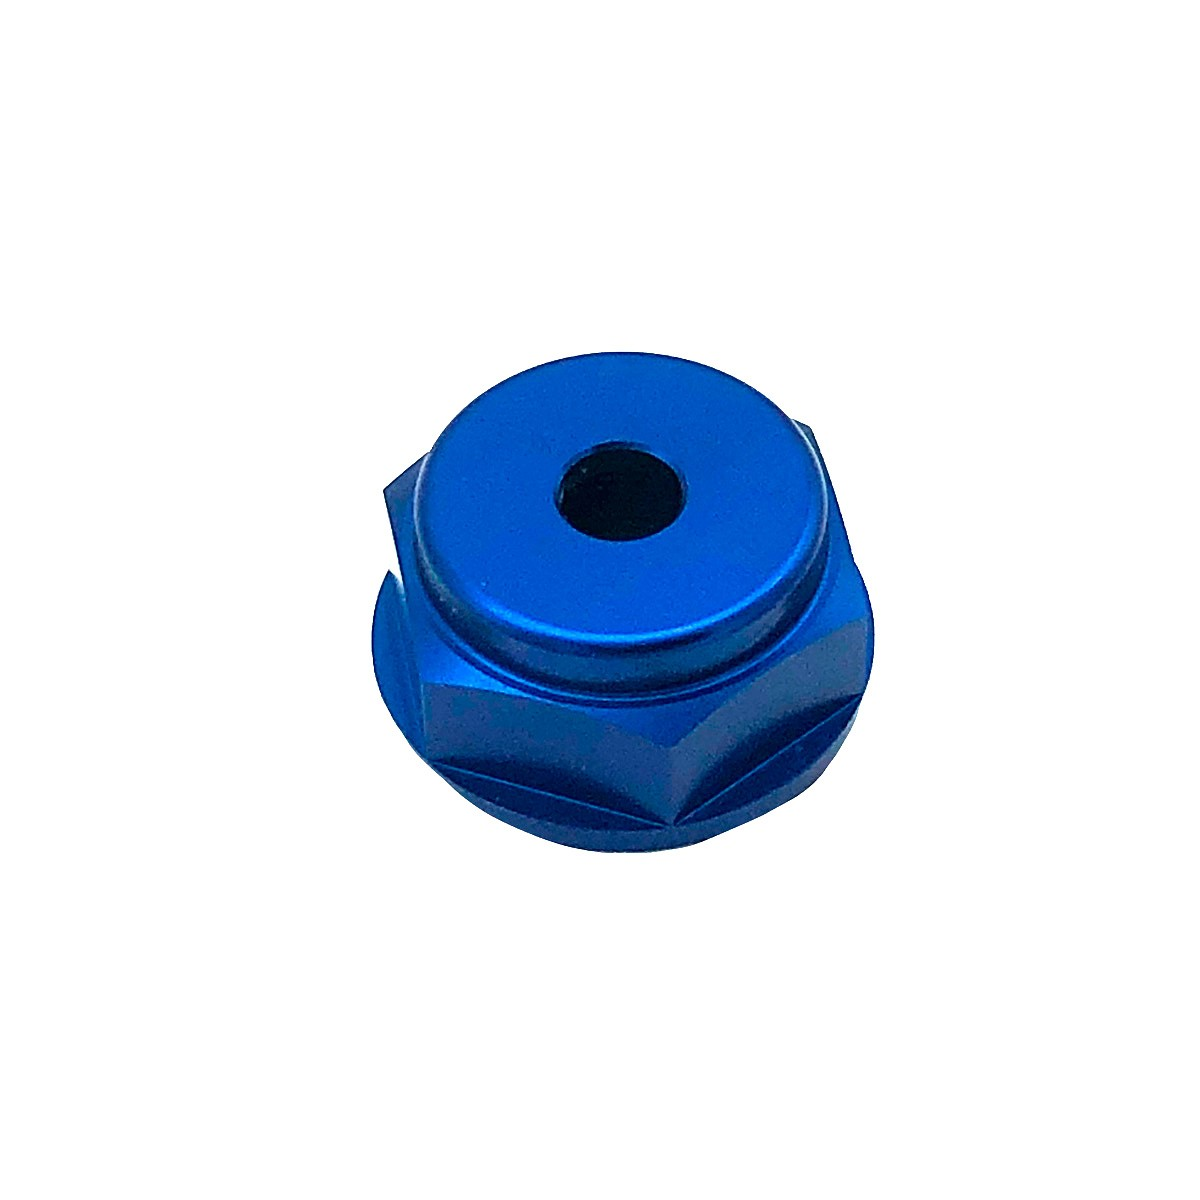 Porca central da mesa 24mm x 1.00mm Furo Central Honda Azul